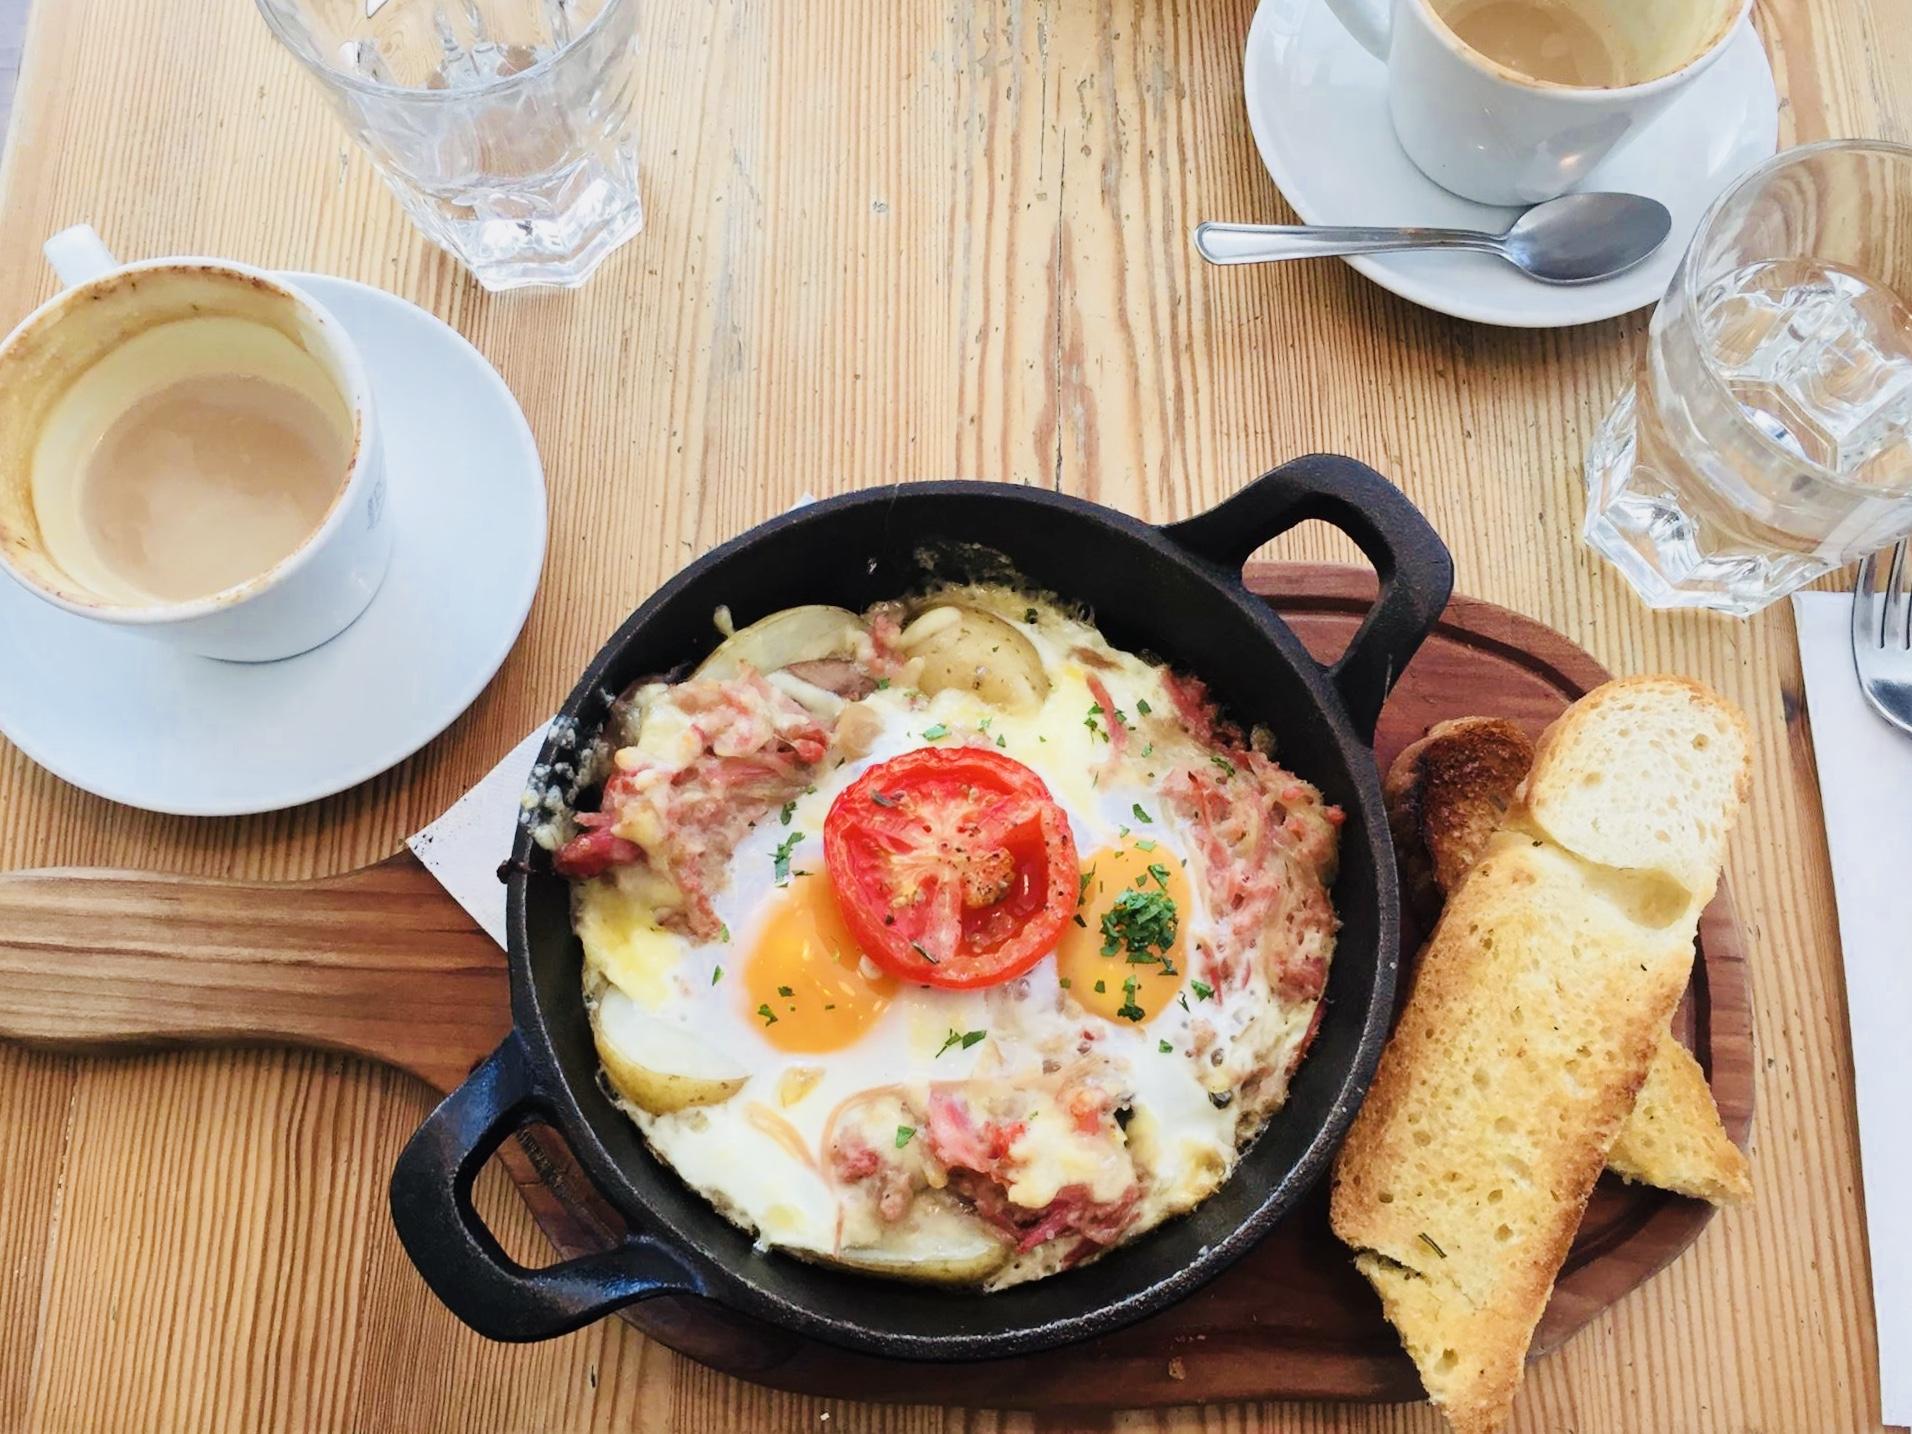 Brit-ish breakfast, but not quite